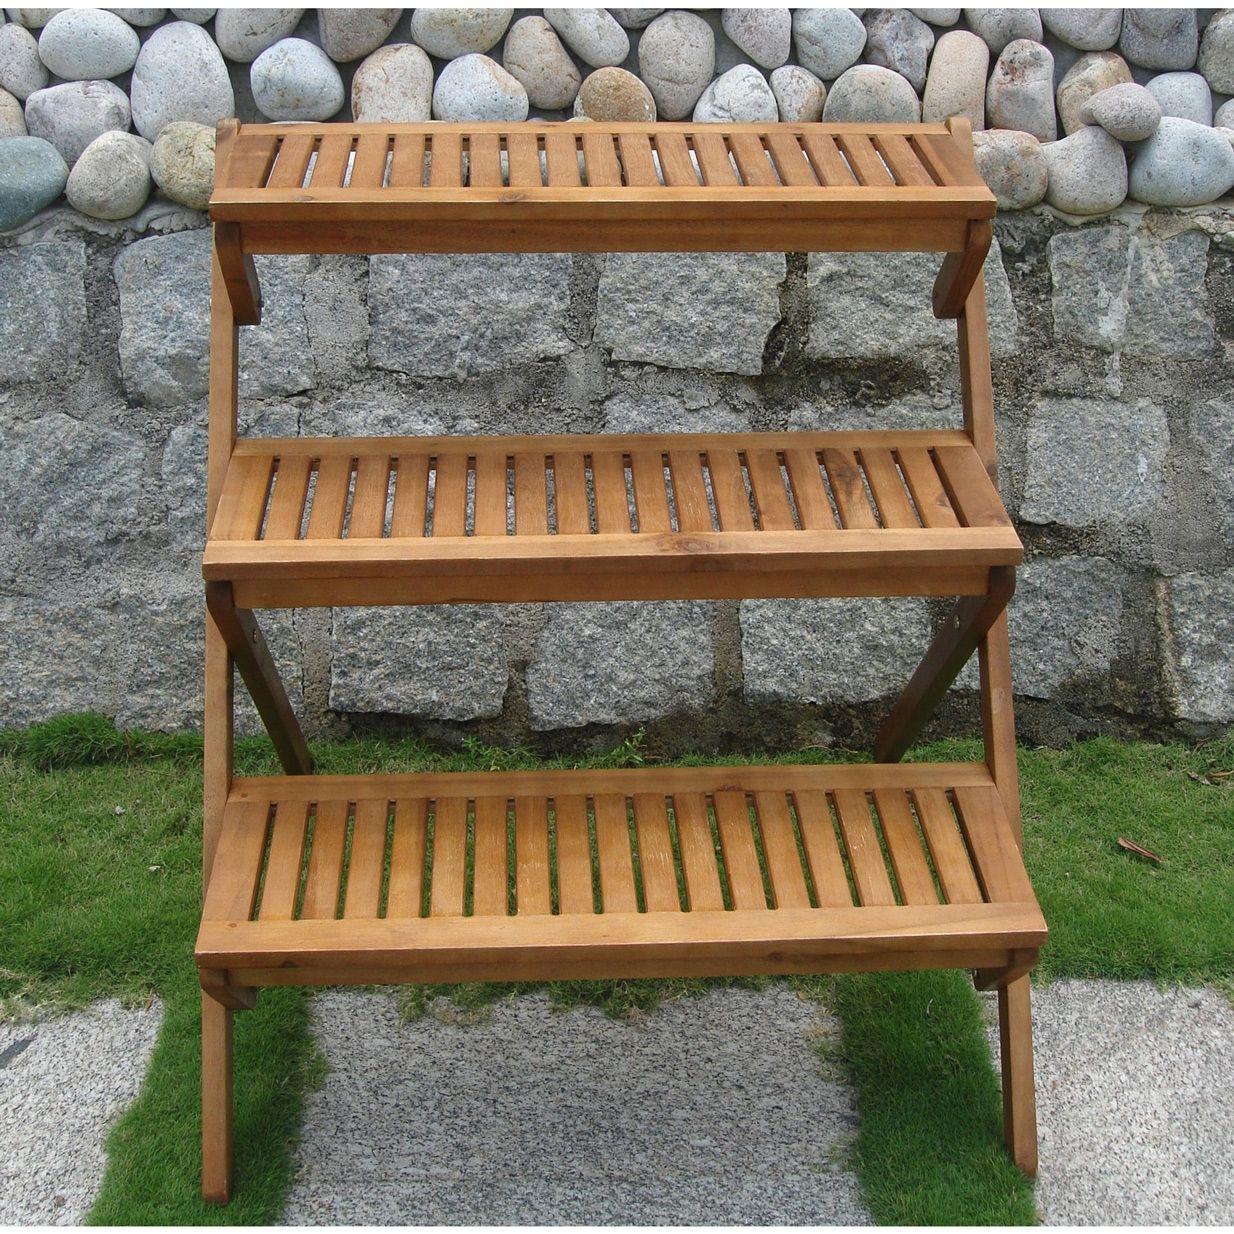 3 Tier Wooden Garden Cart Planter Cooks Porch Tiered Planter